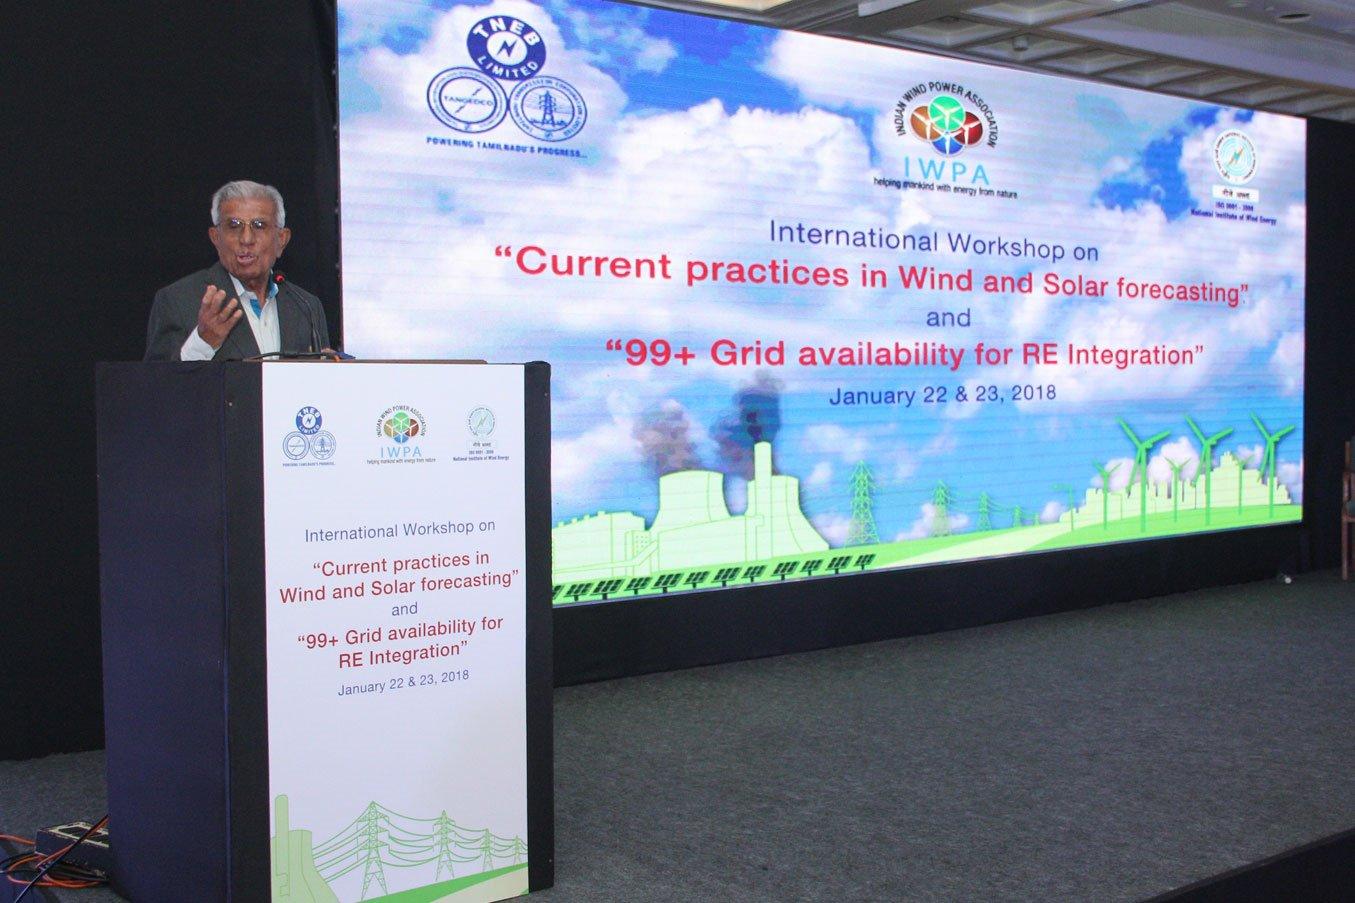 Indian Wind Power Association